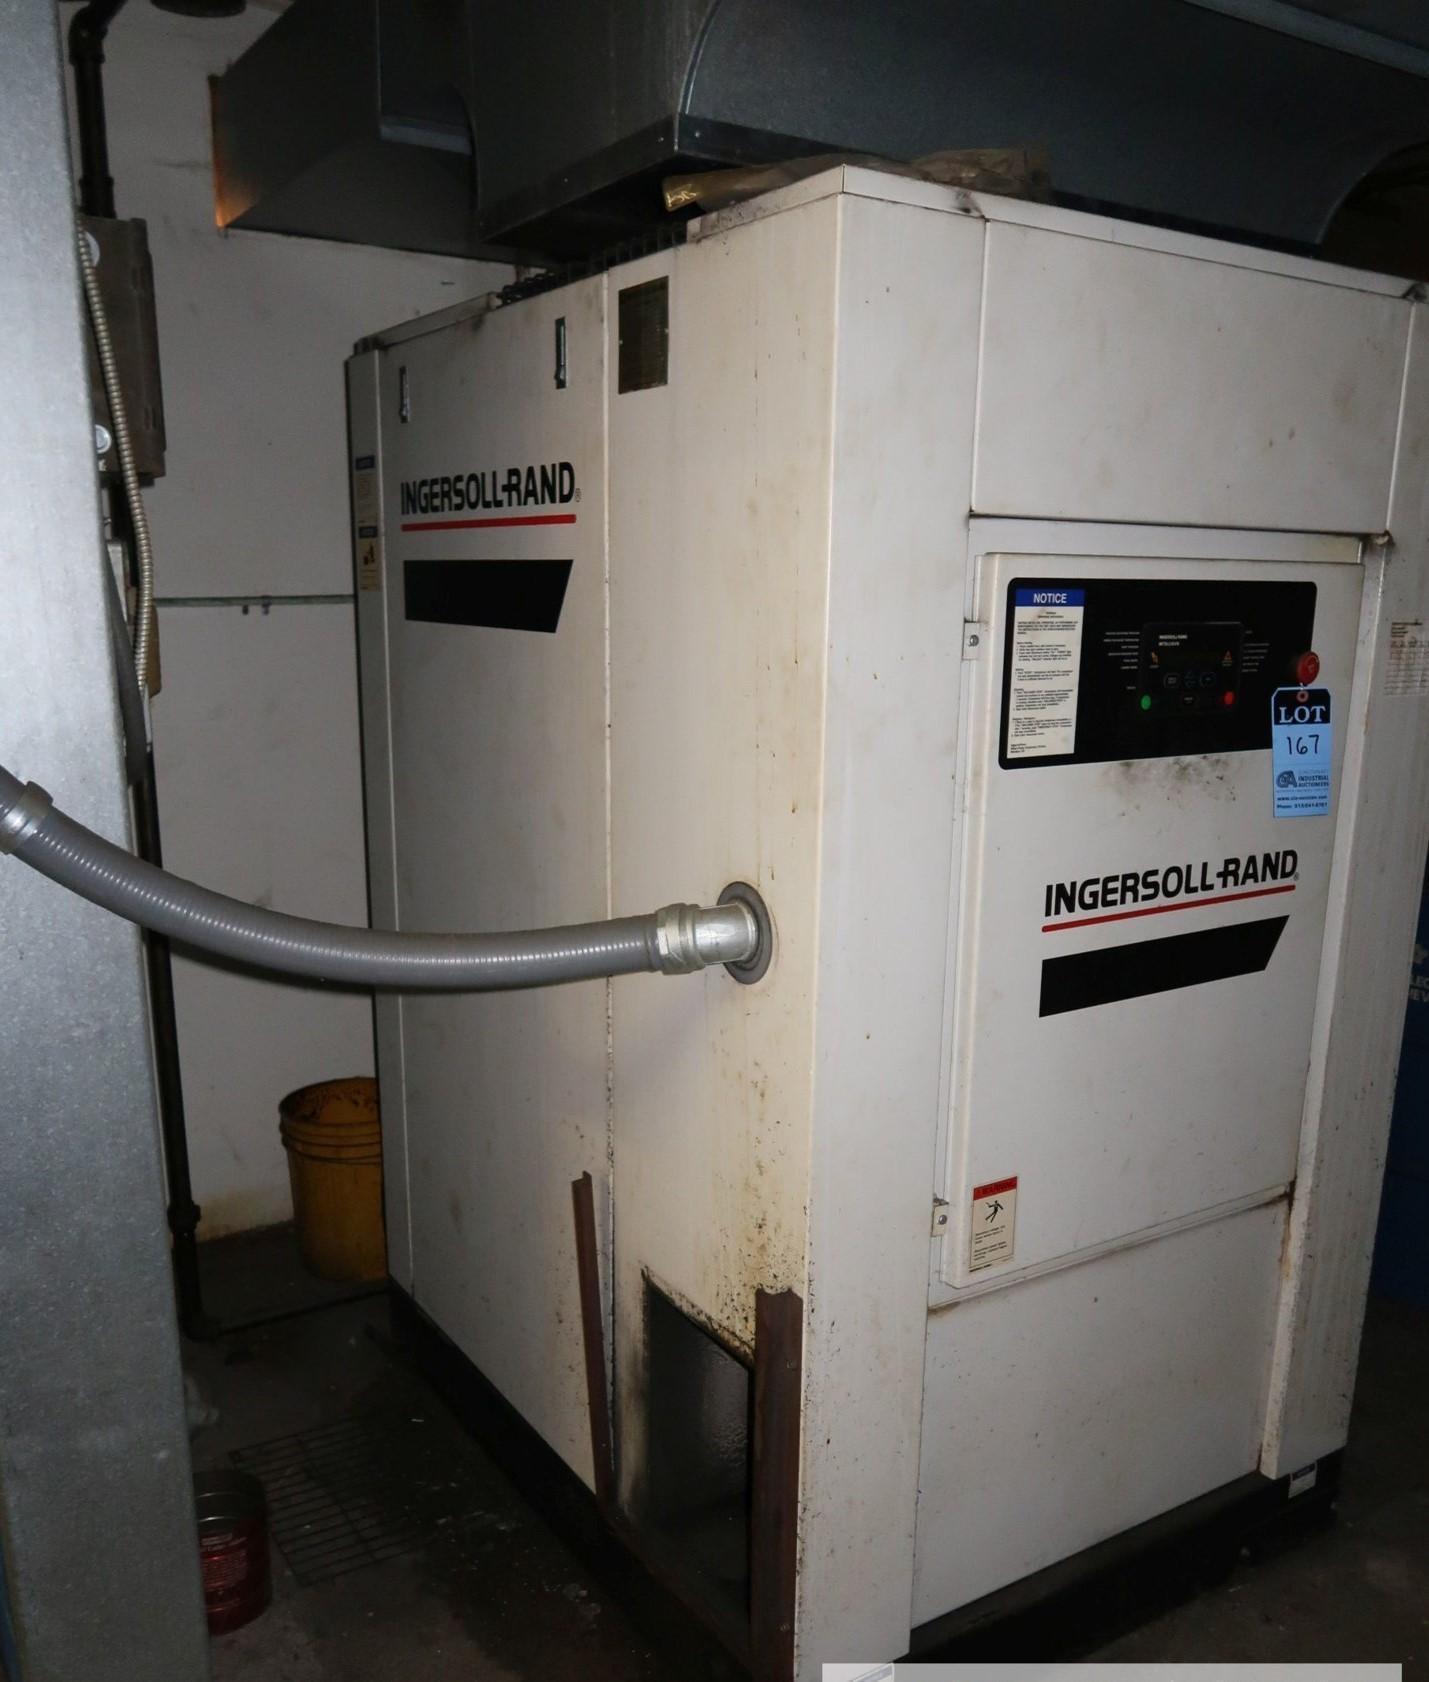 50-HP INGERSOLL RAND MODEL SSR-EP50SE AIR COMPRESSOR; S/N G7348U98307, 125 PSIG